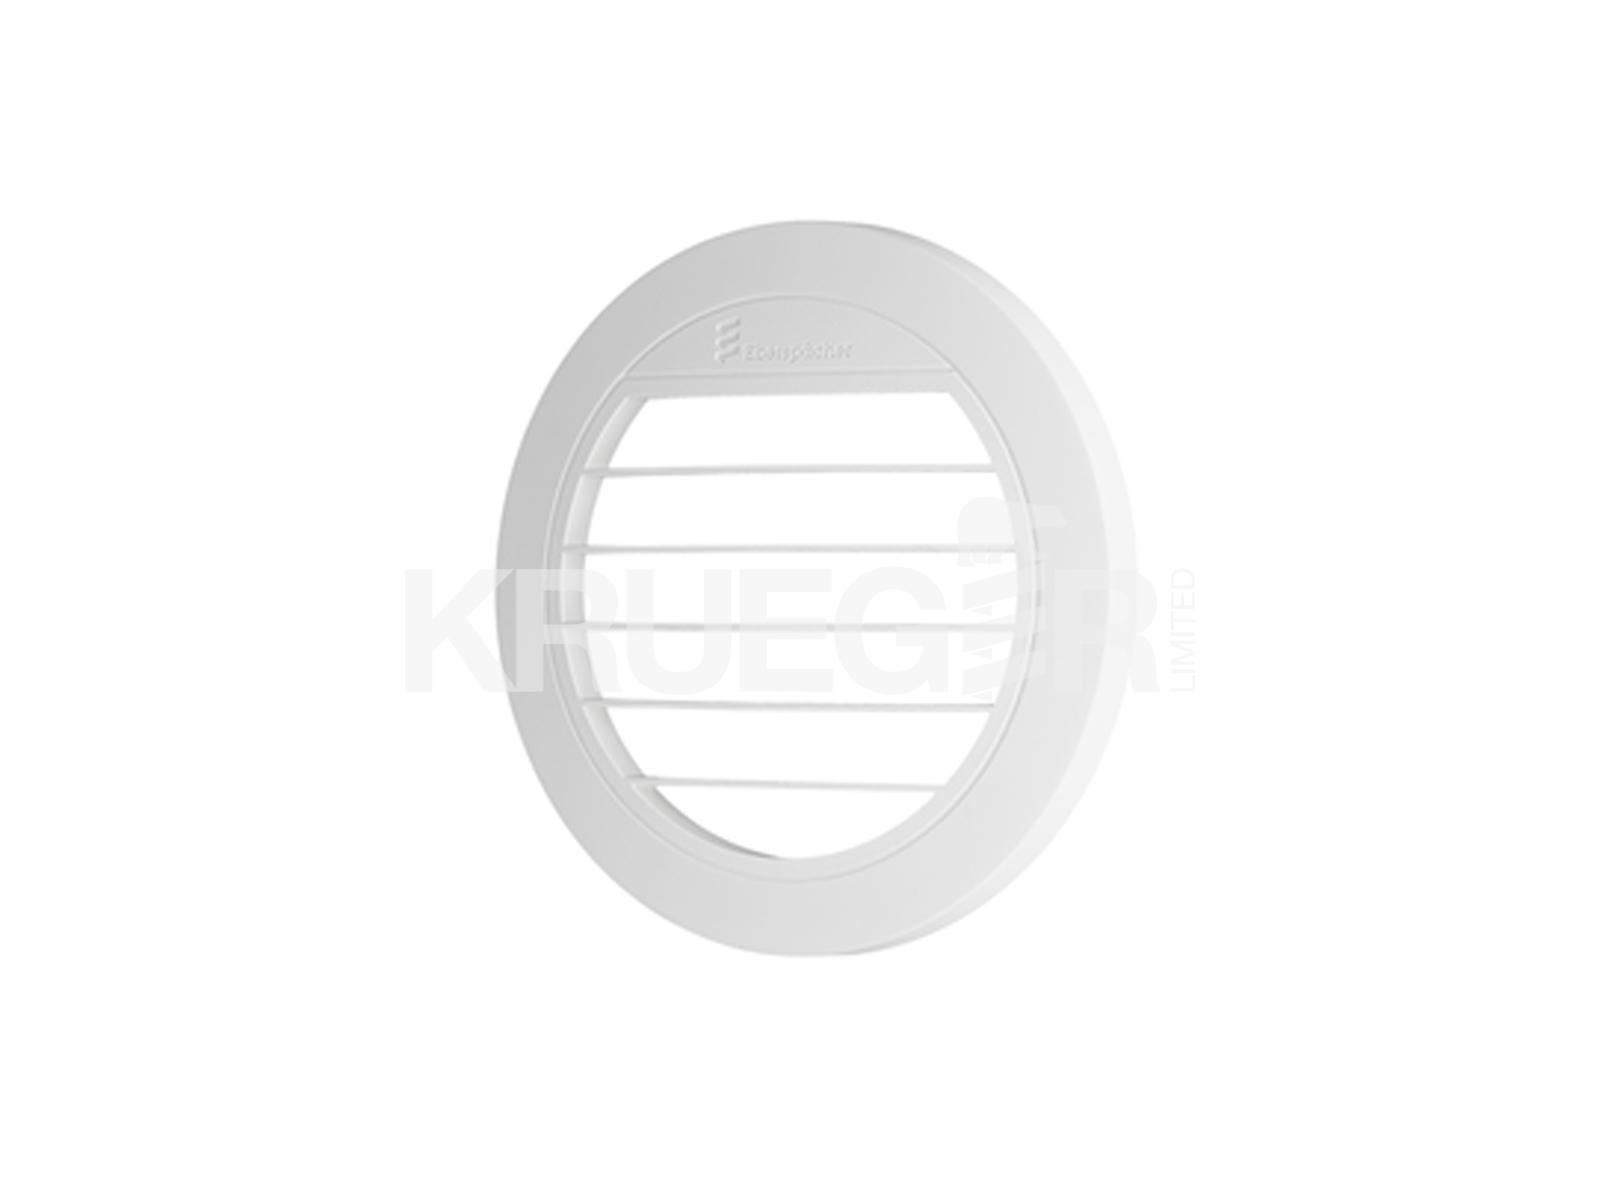 White Open Air Intake